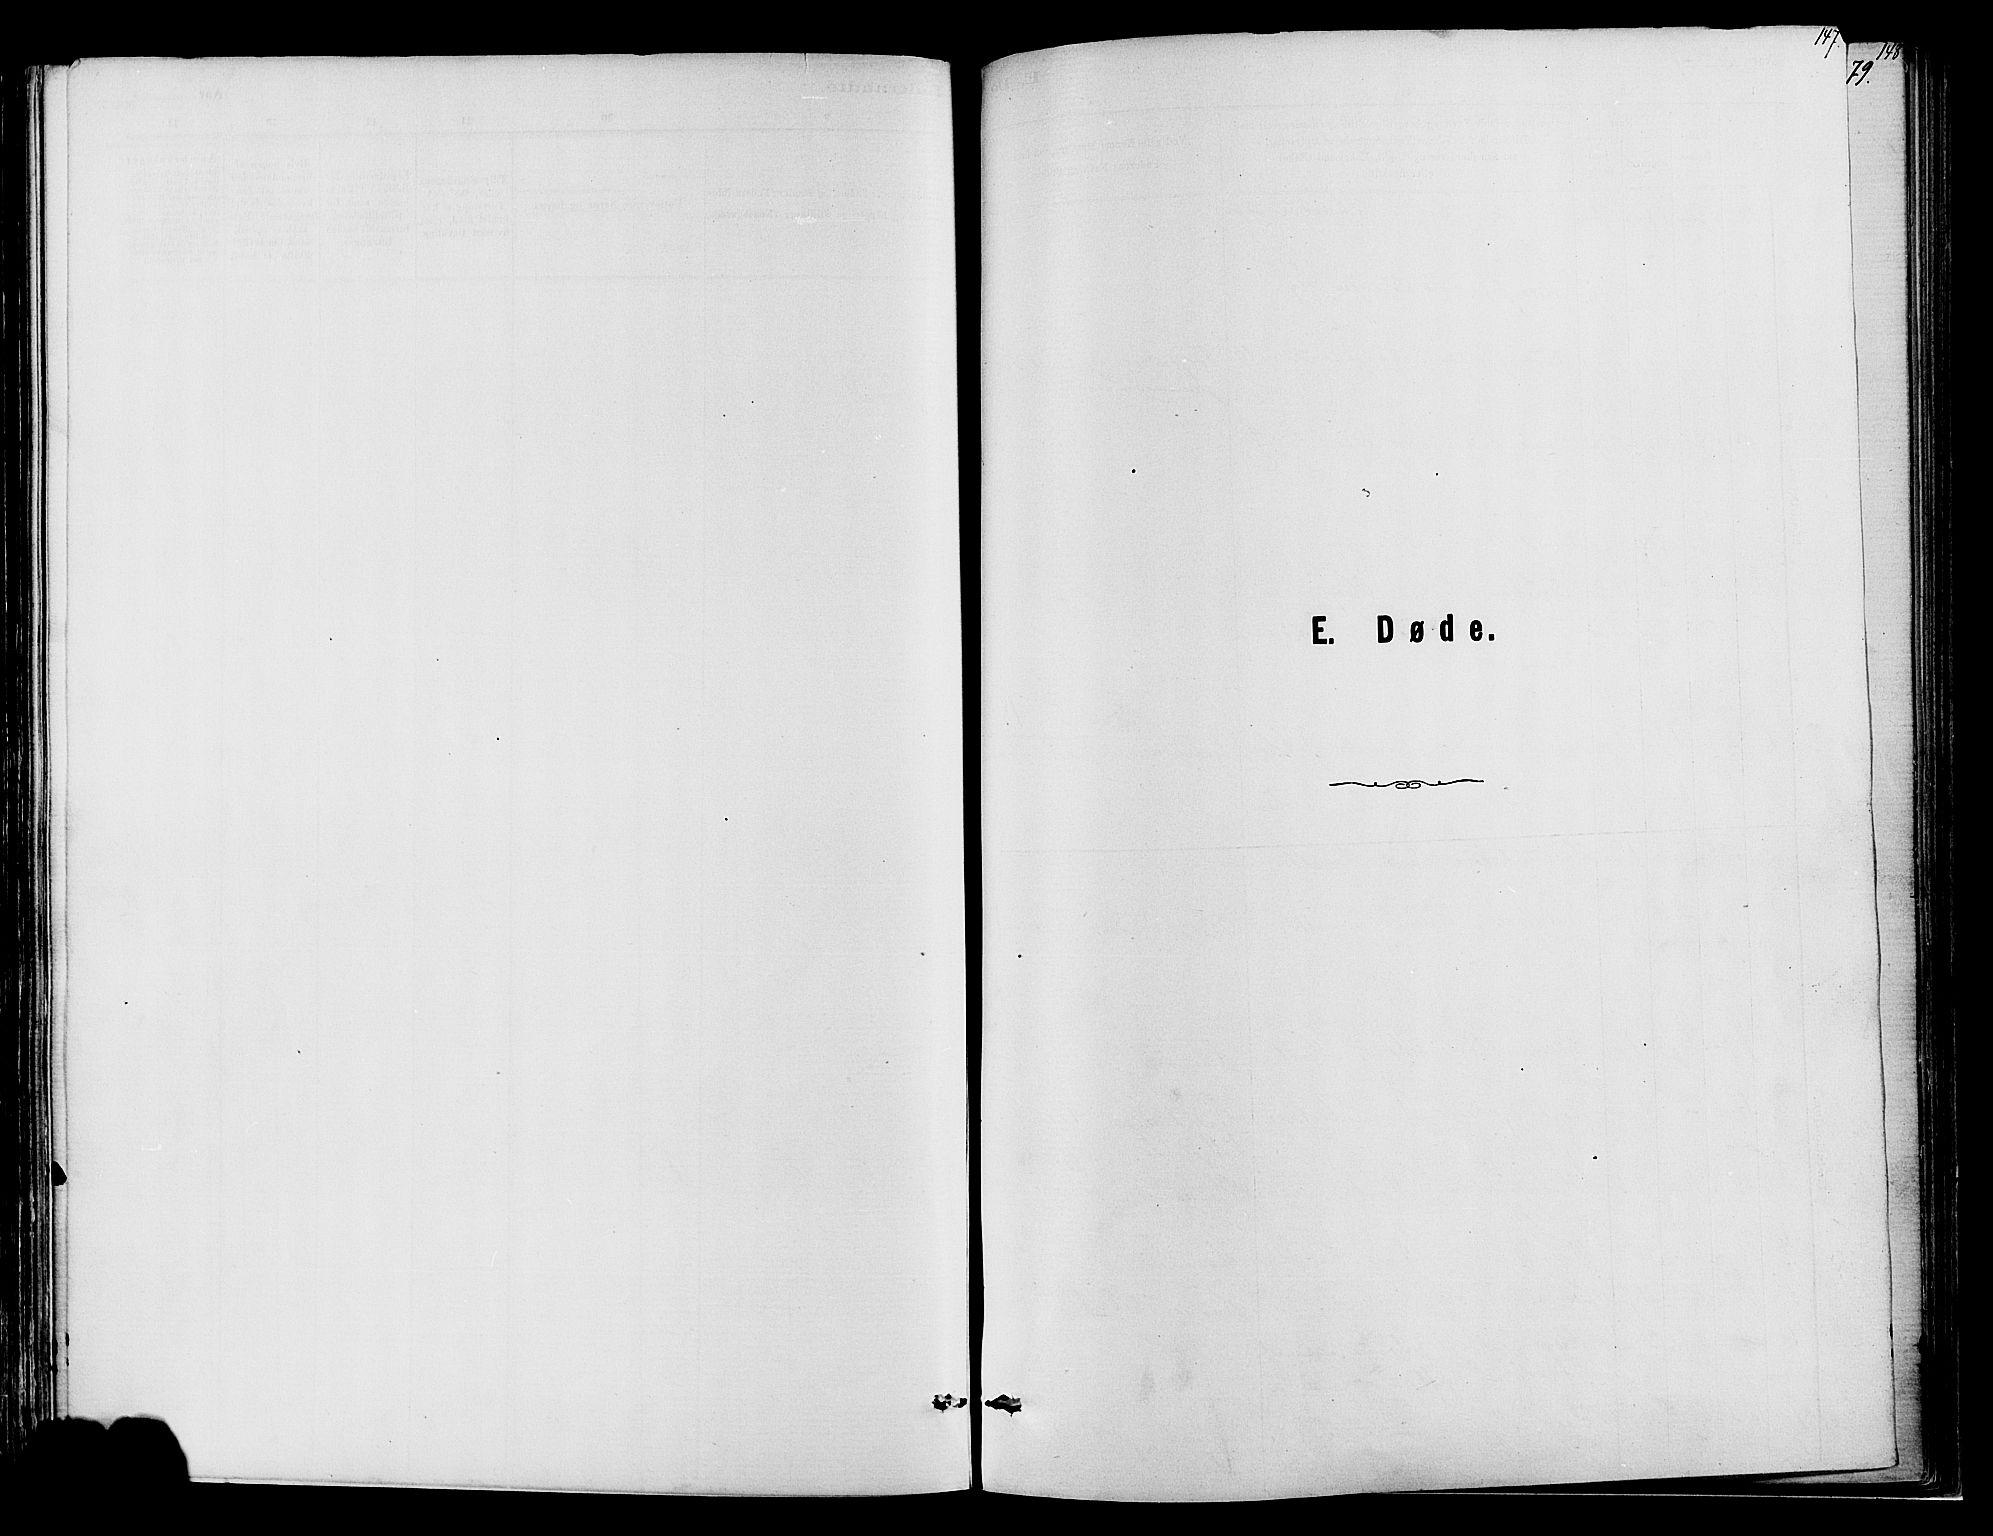 SAH, Vardal prestekontor, H/Ha/Haa/L0009: Ministerialbok nr. 9, 1878-1892, s. 147